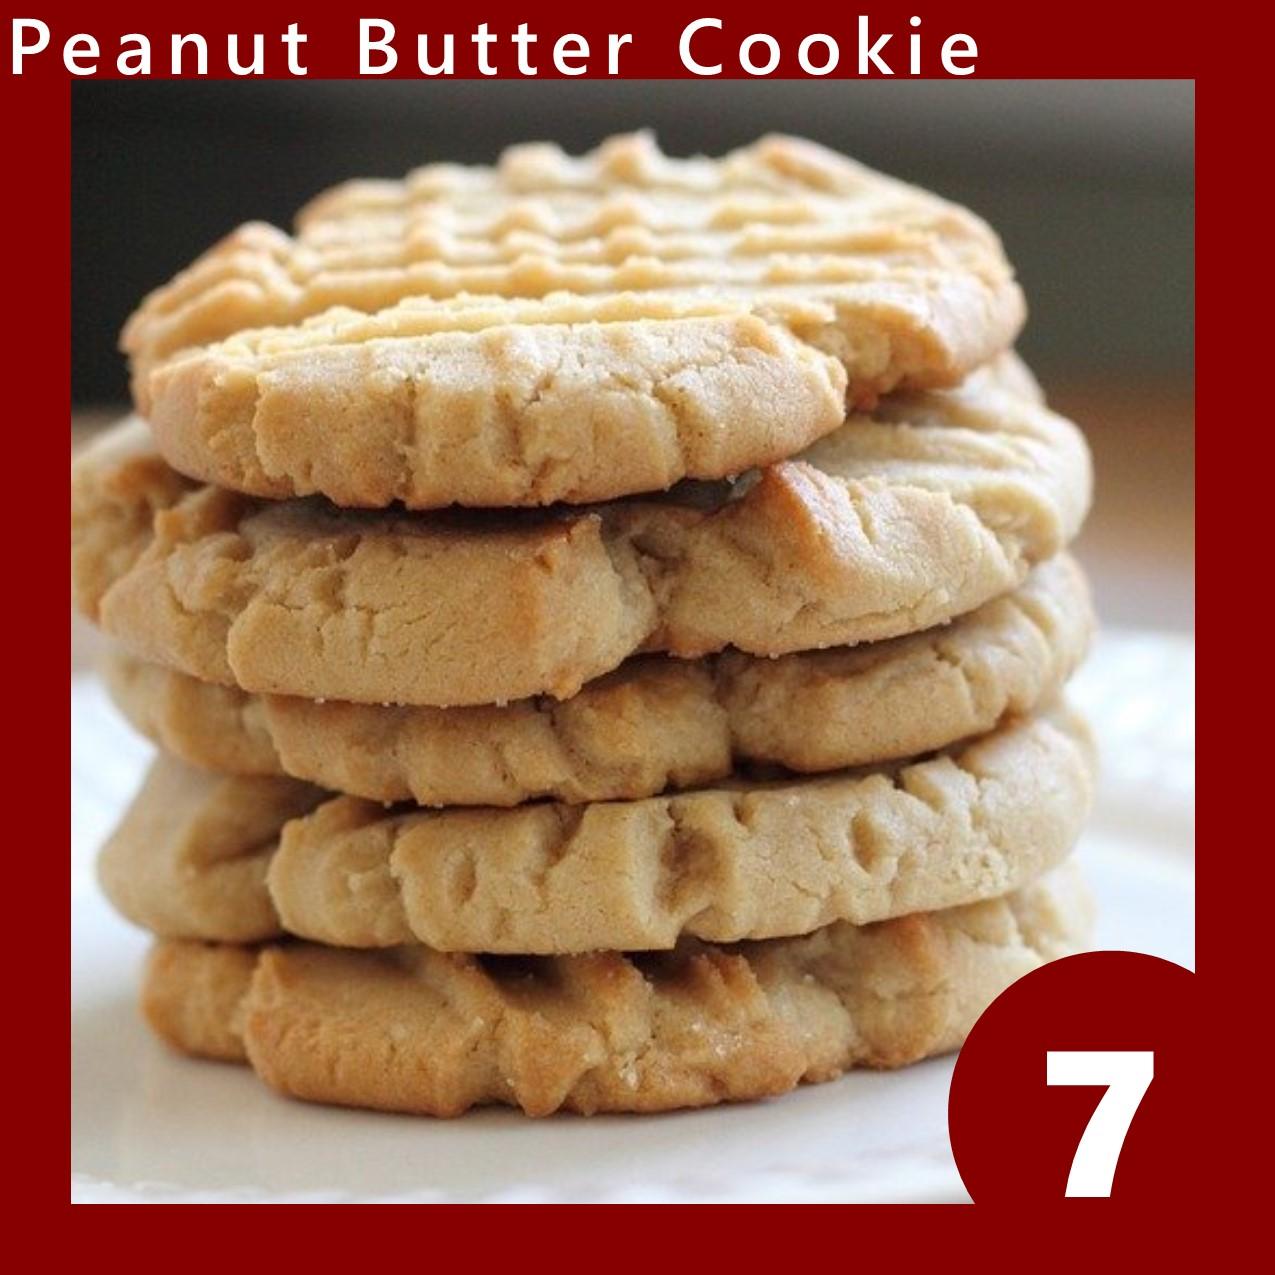 peanut butter cookie